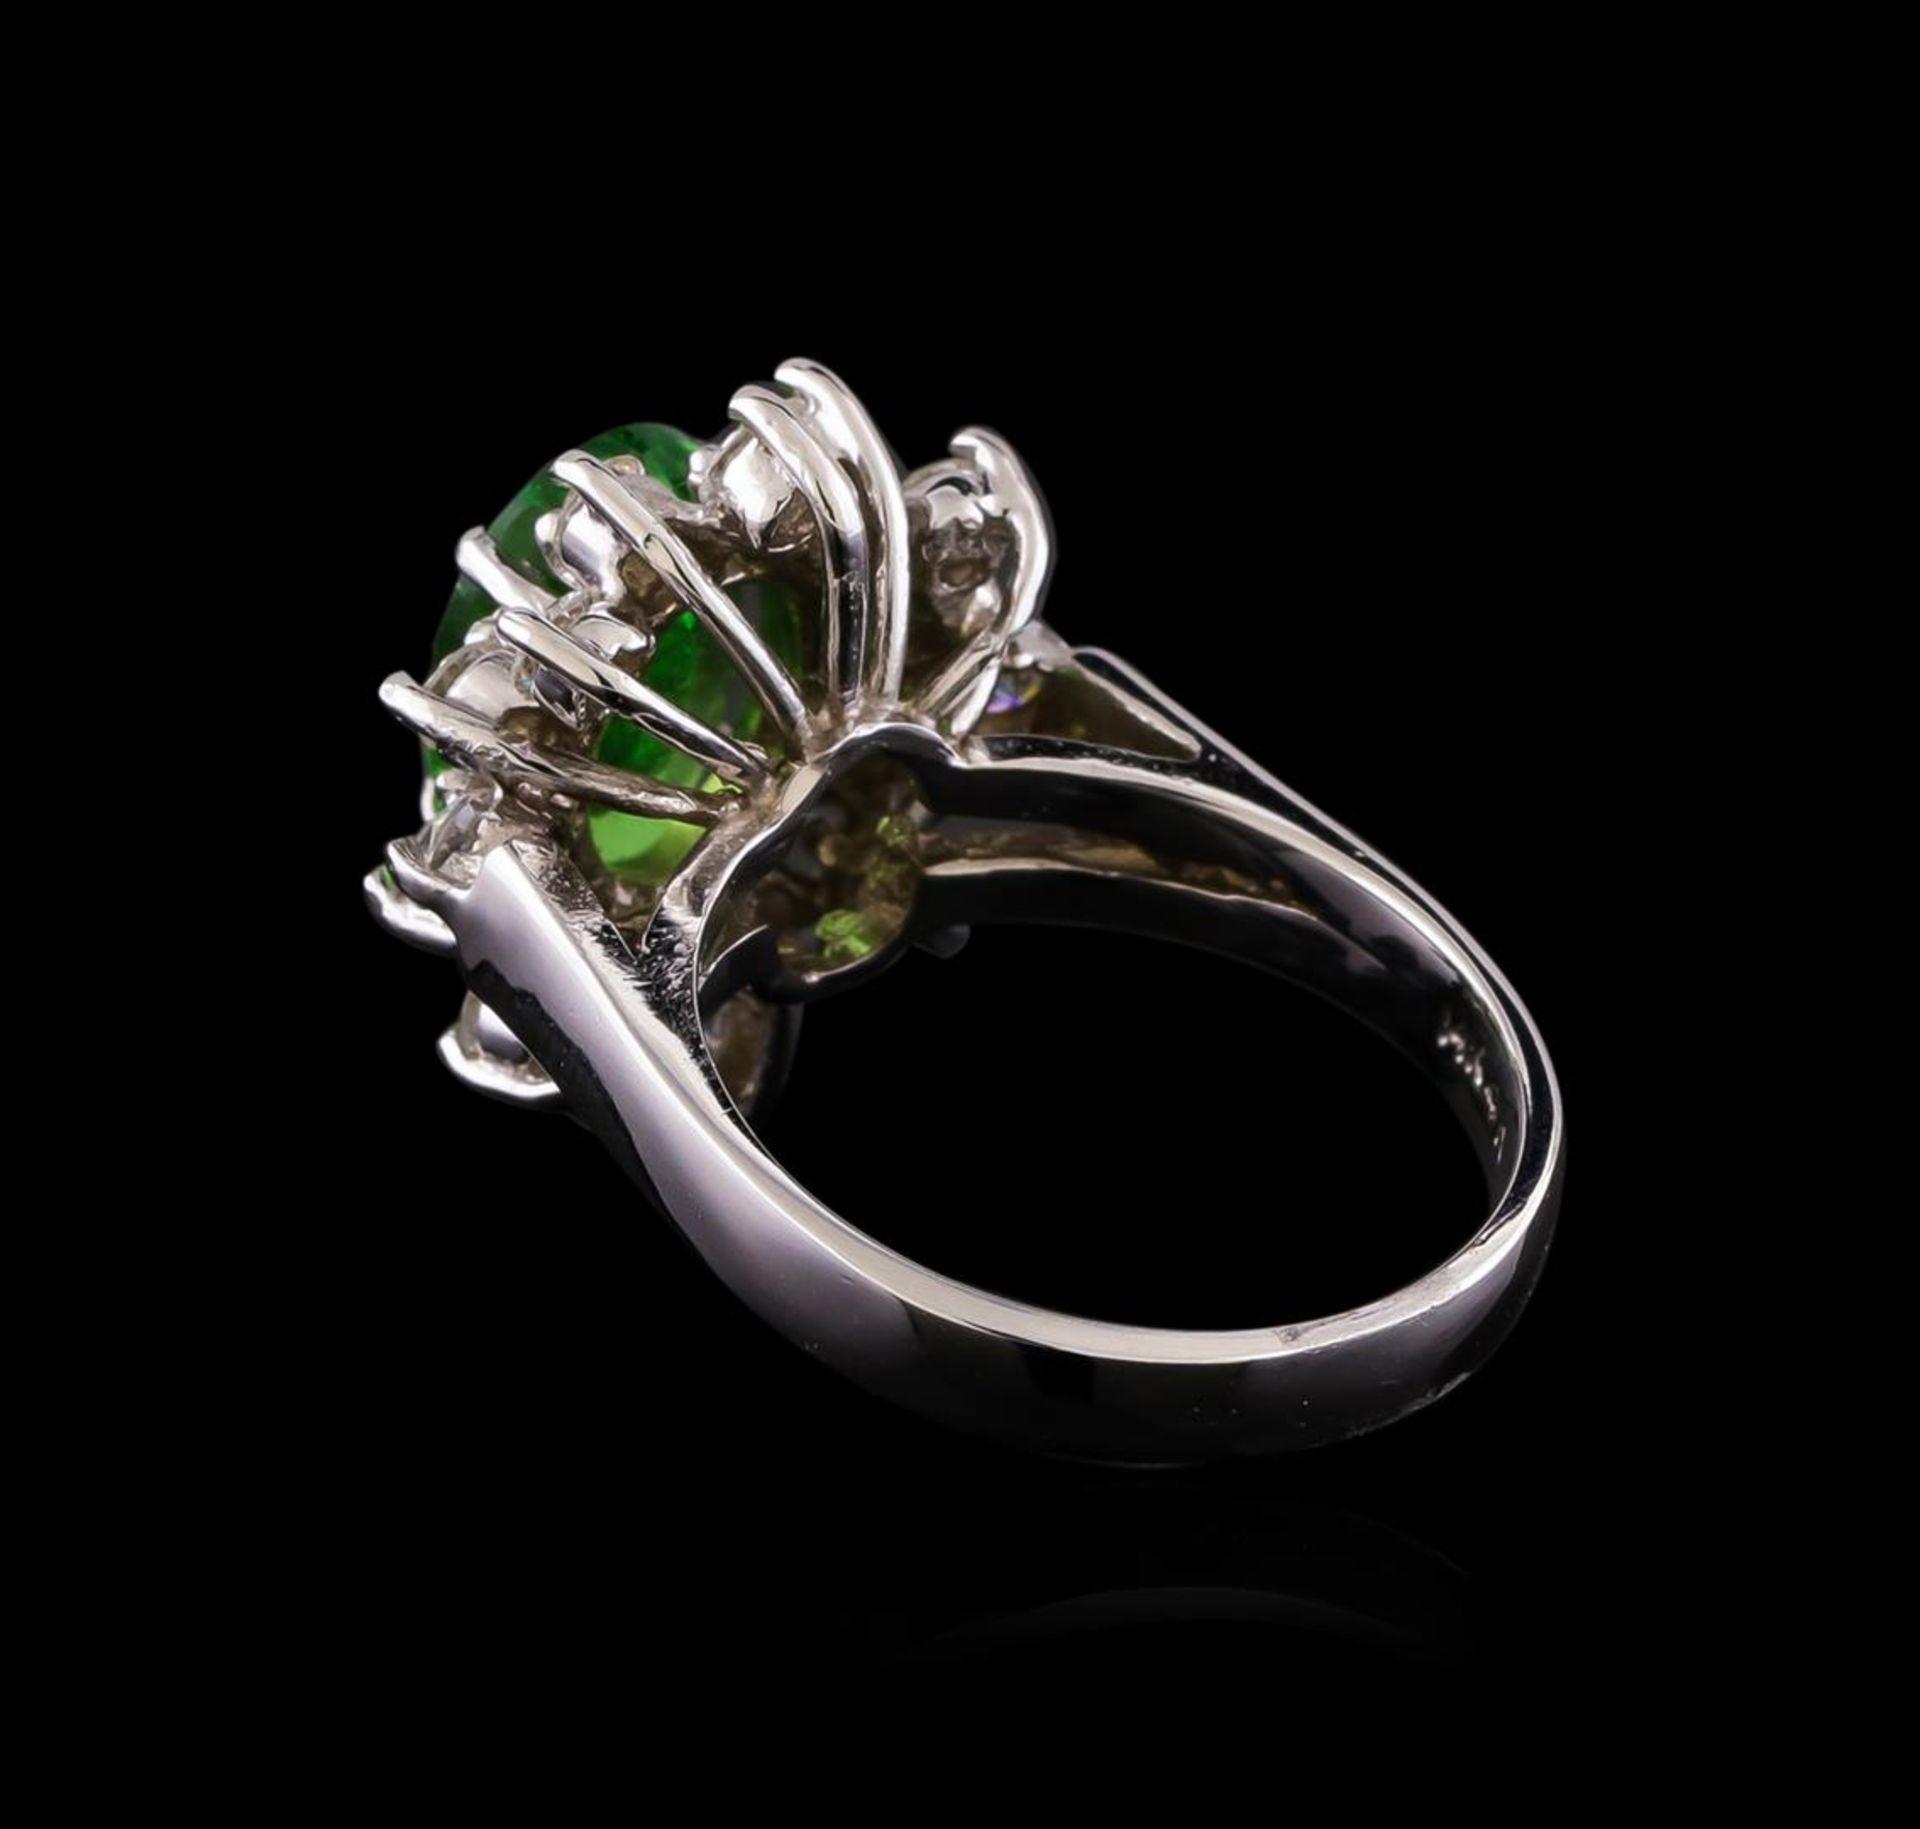 2.51 ctw Tsavorite and Diamond Ring - 14KT White Gold - Image 3 of 5